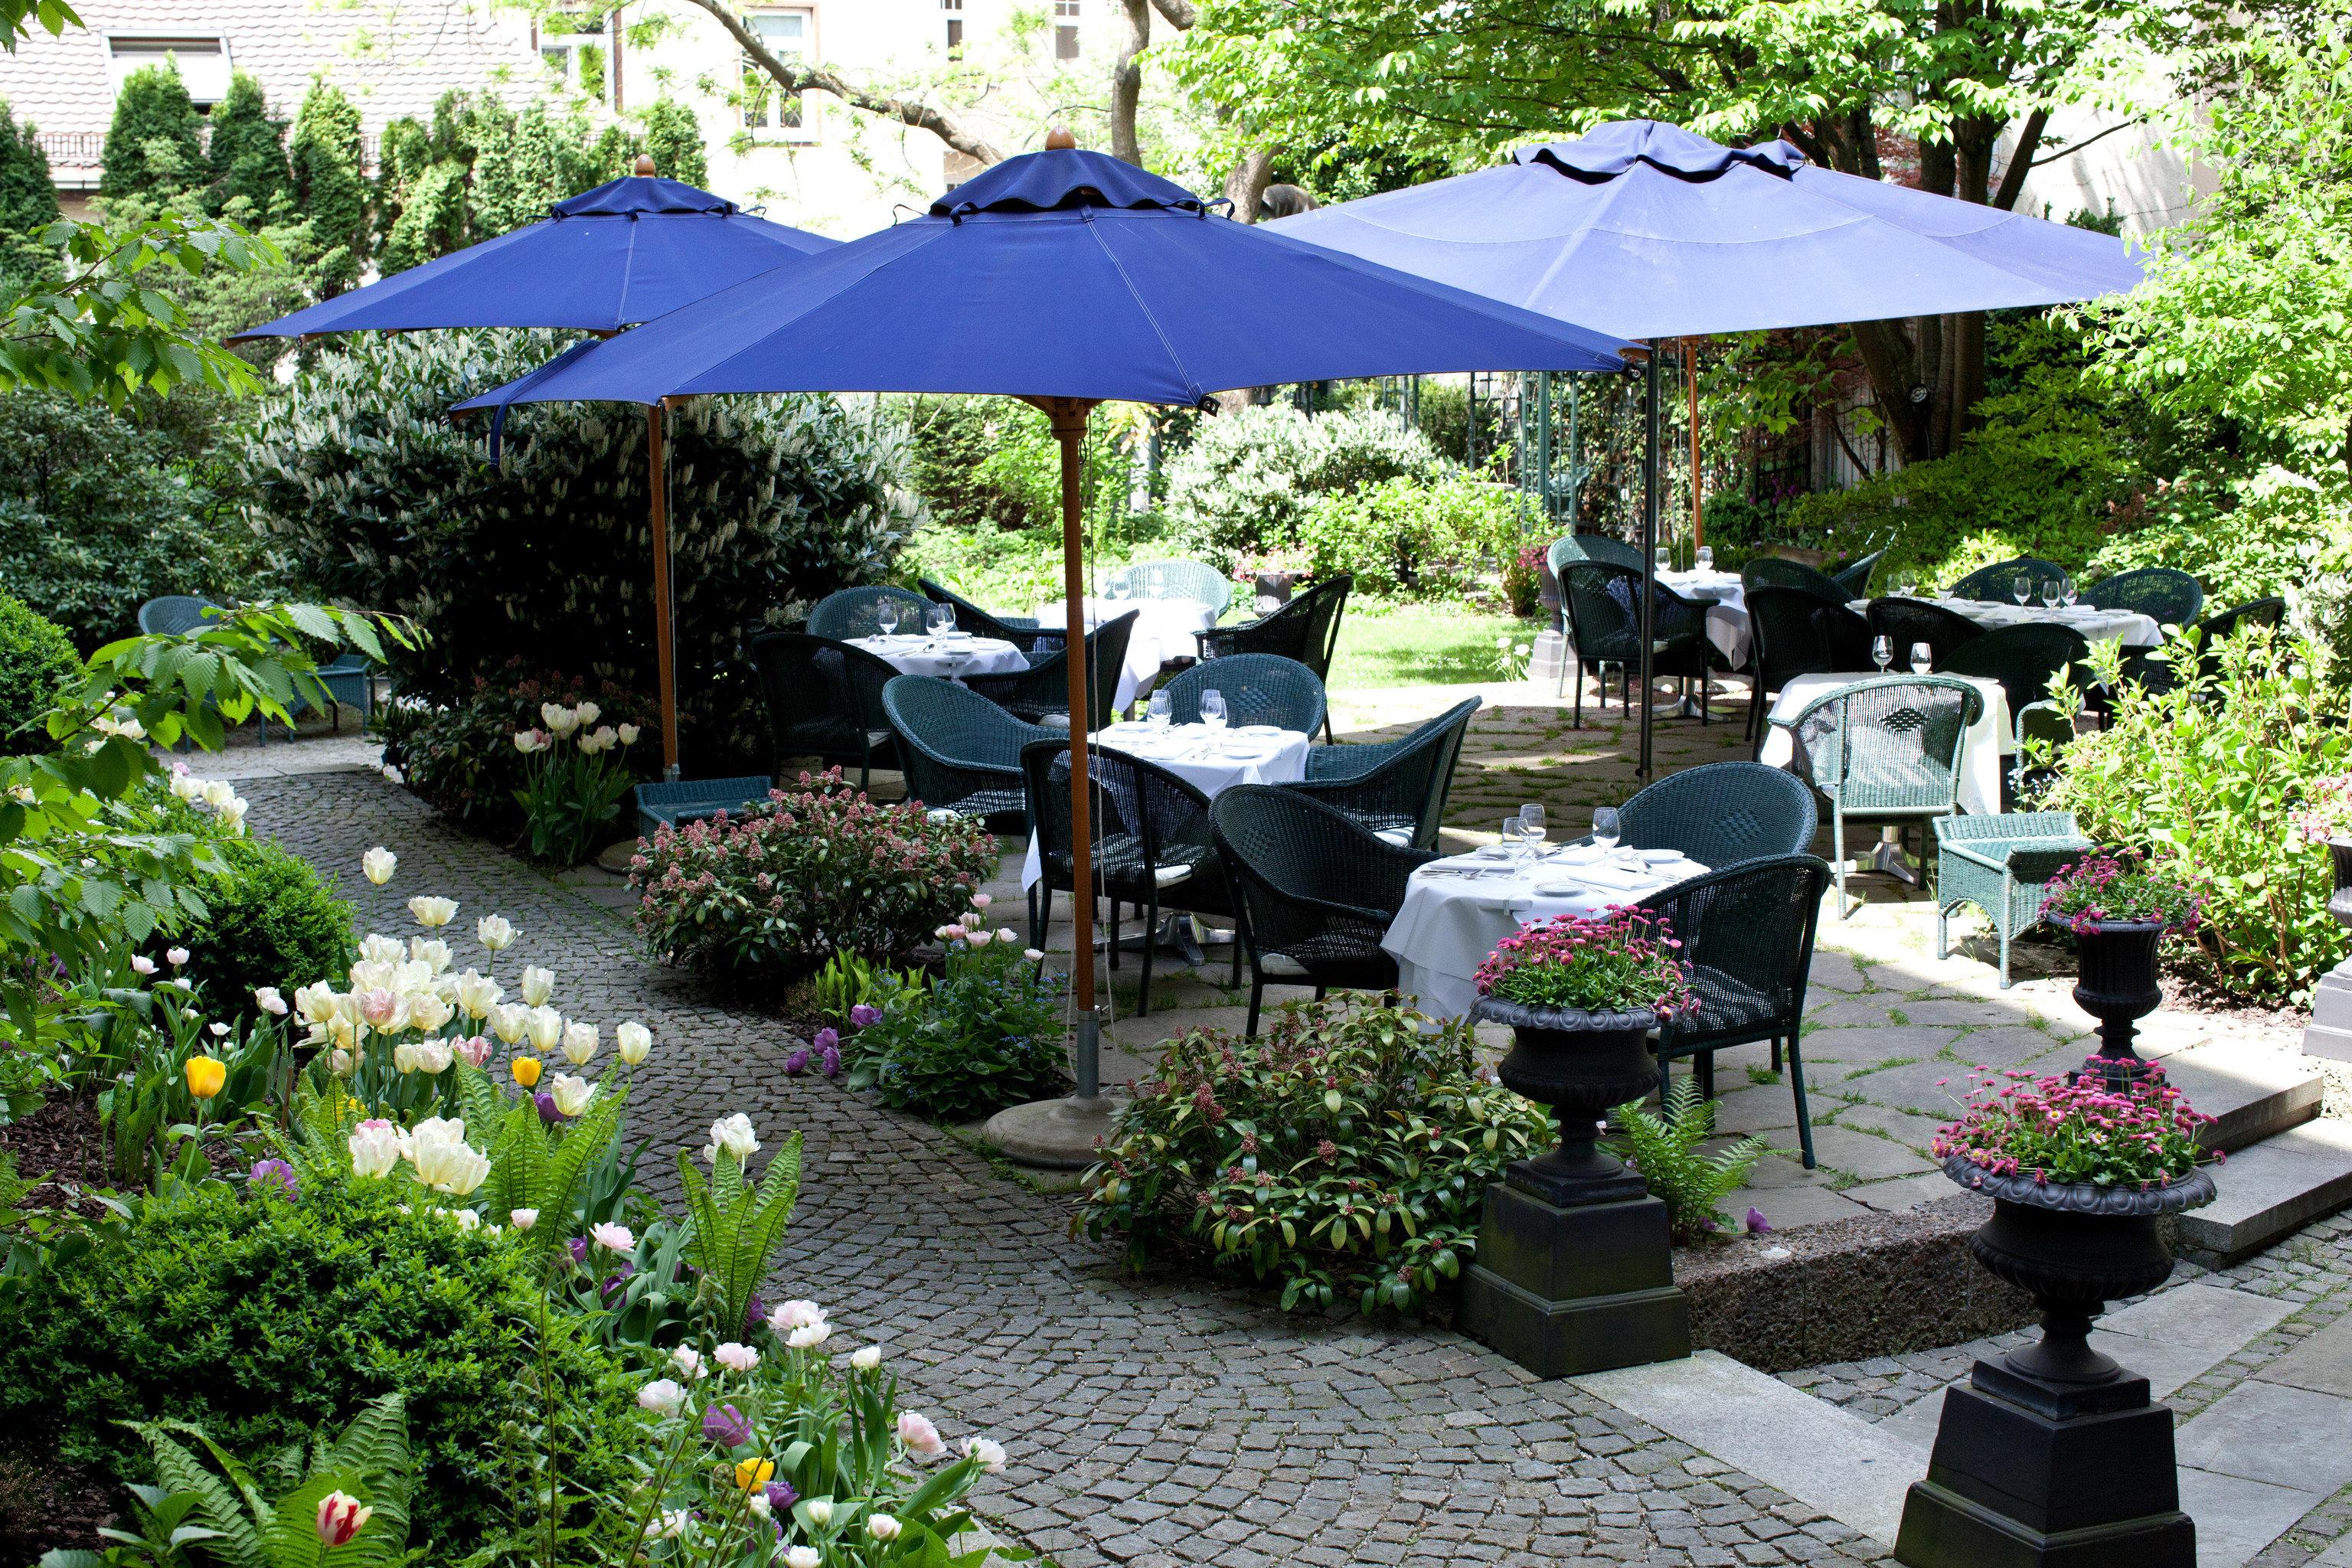 tree umbrella floristry Garden backyard flower lawn outdoor structure yard plant set bushes Resort shade